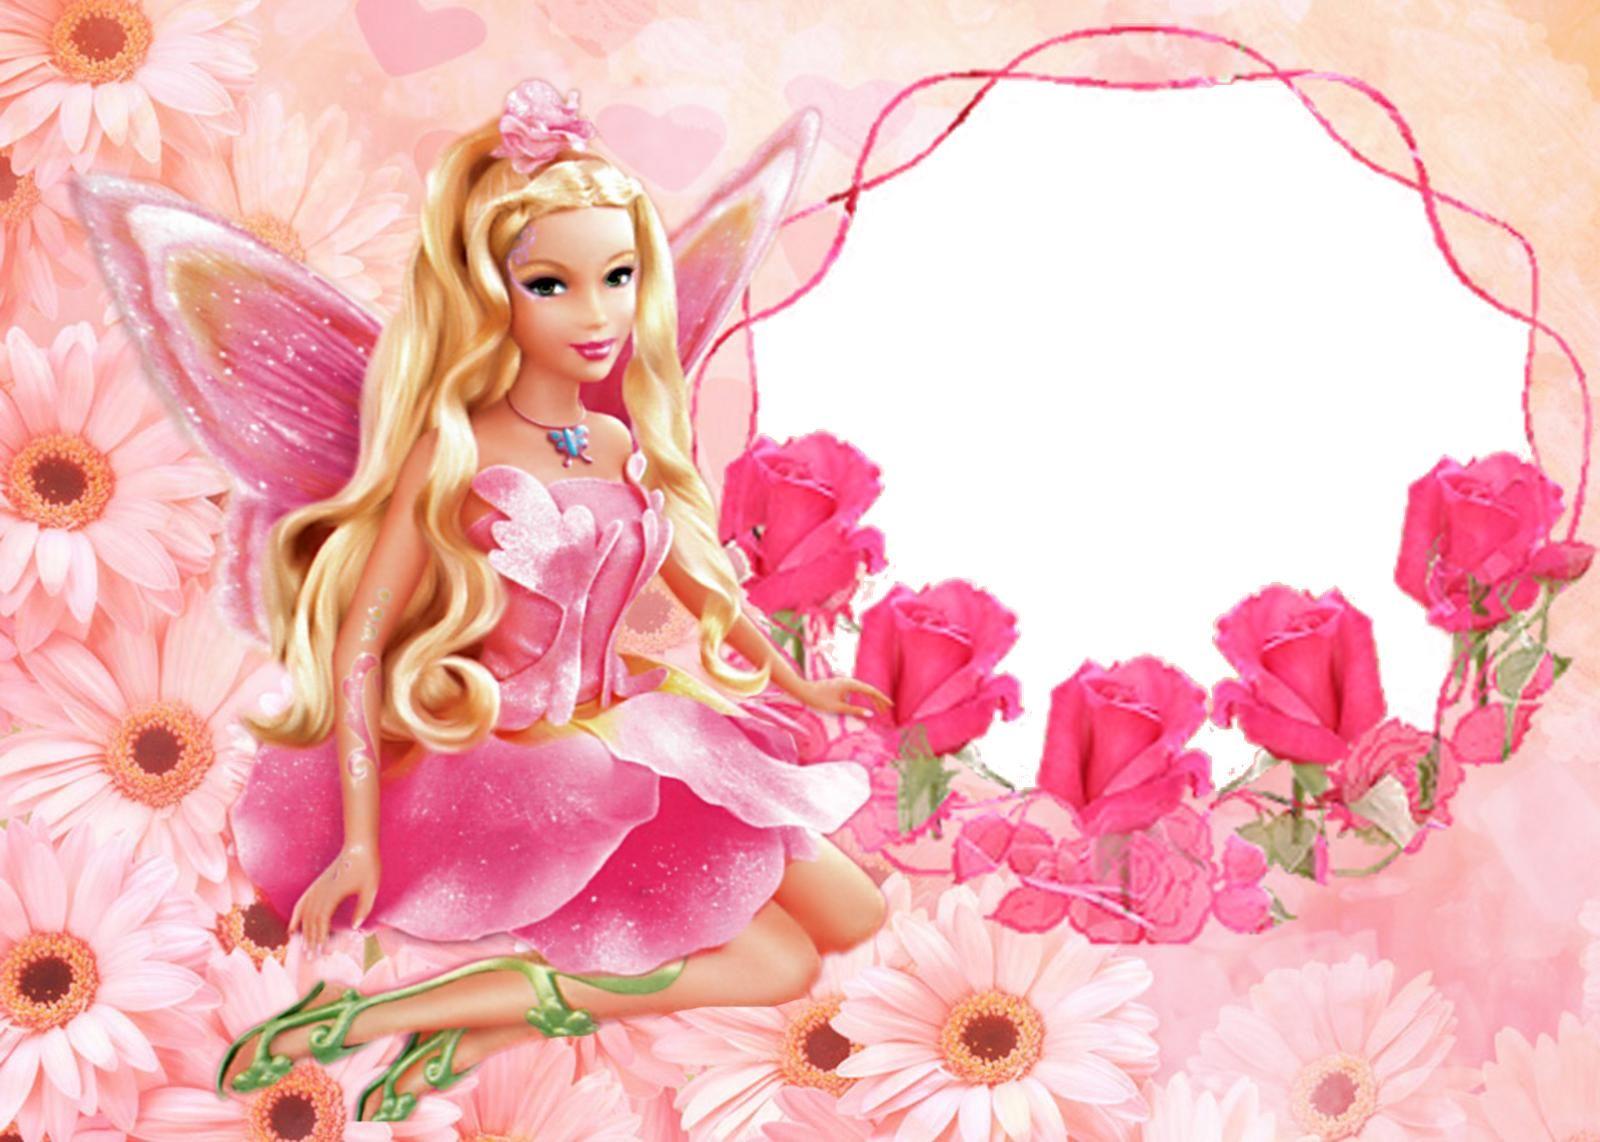 Popular Wallpaper Mobile Barbie - b9e8770aa3307034b4ae853b5c42e23c  Pictures_41885.jpg